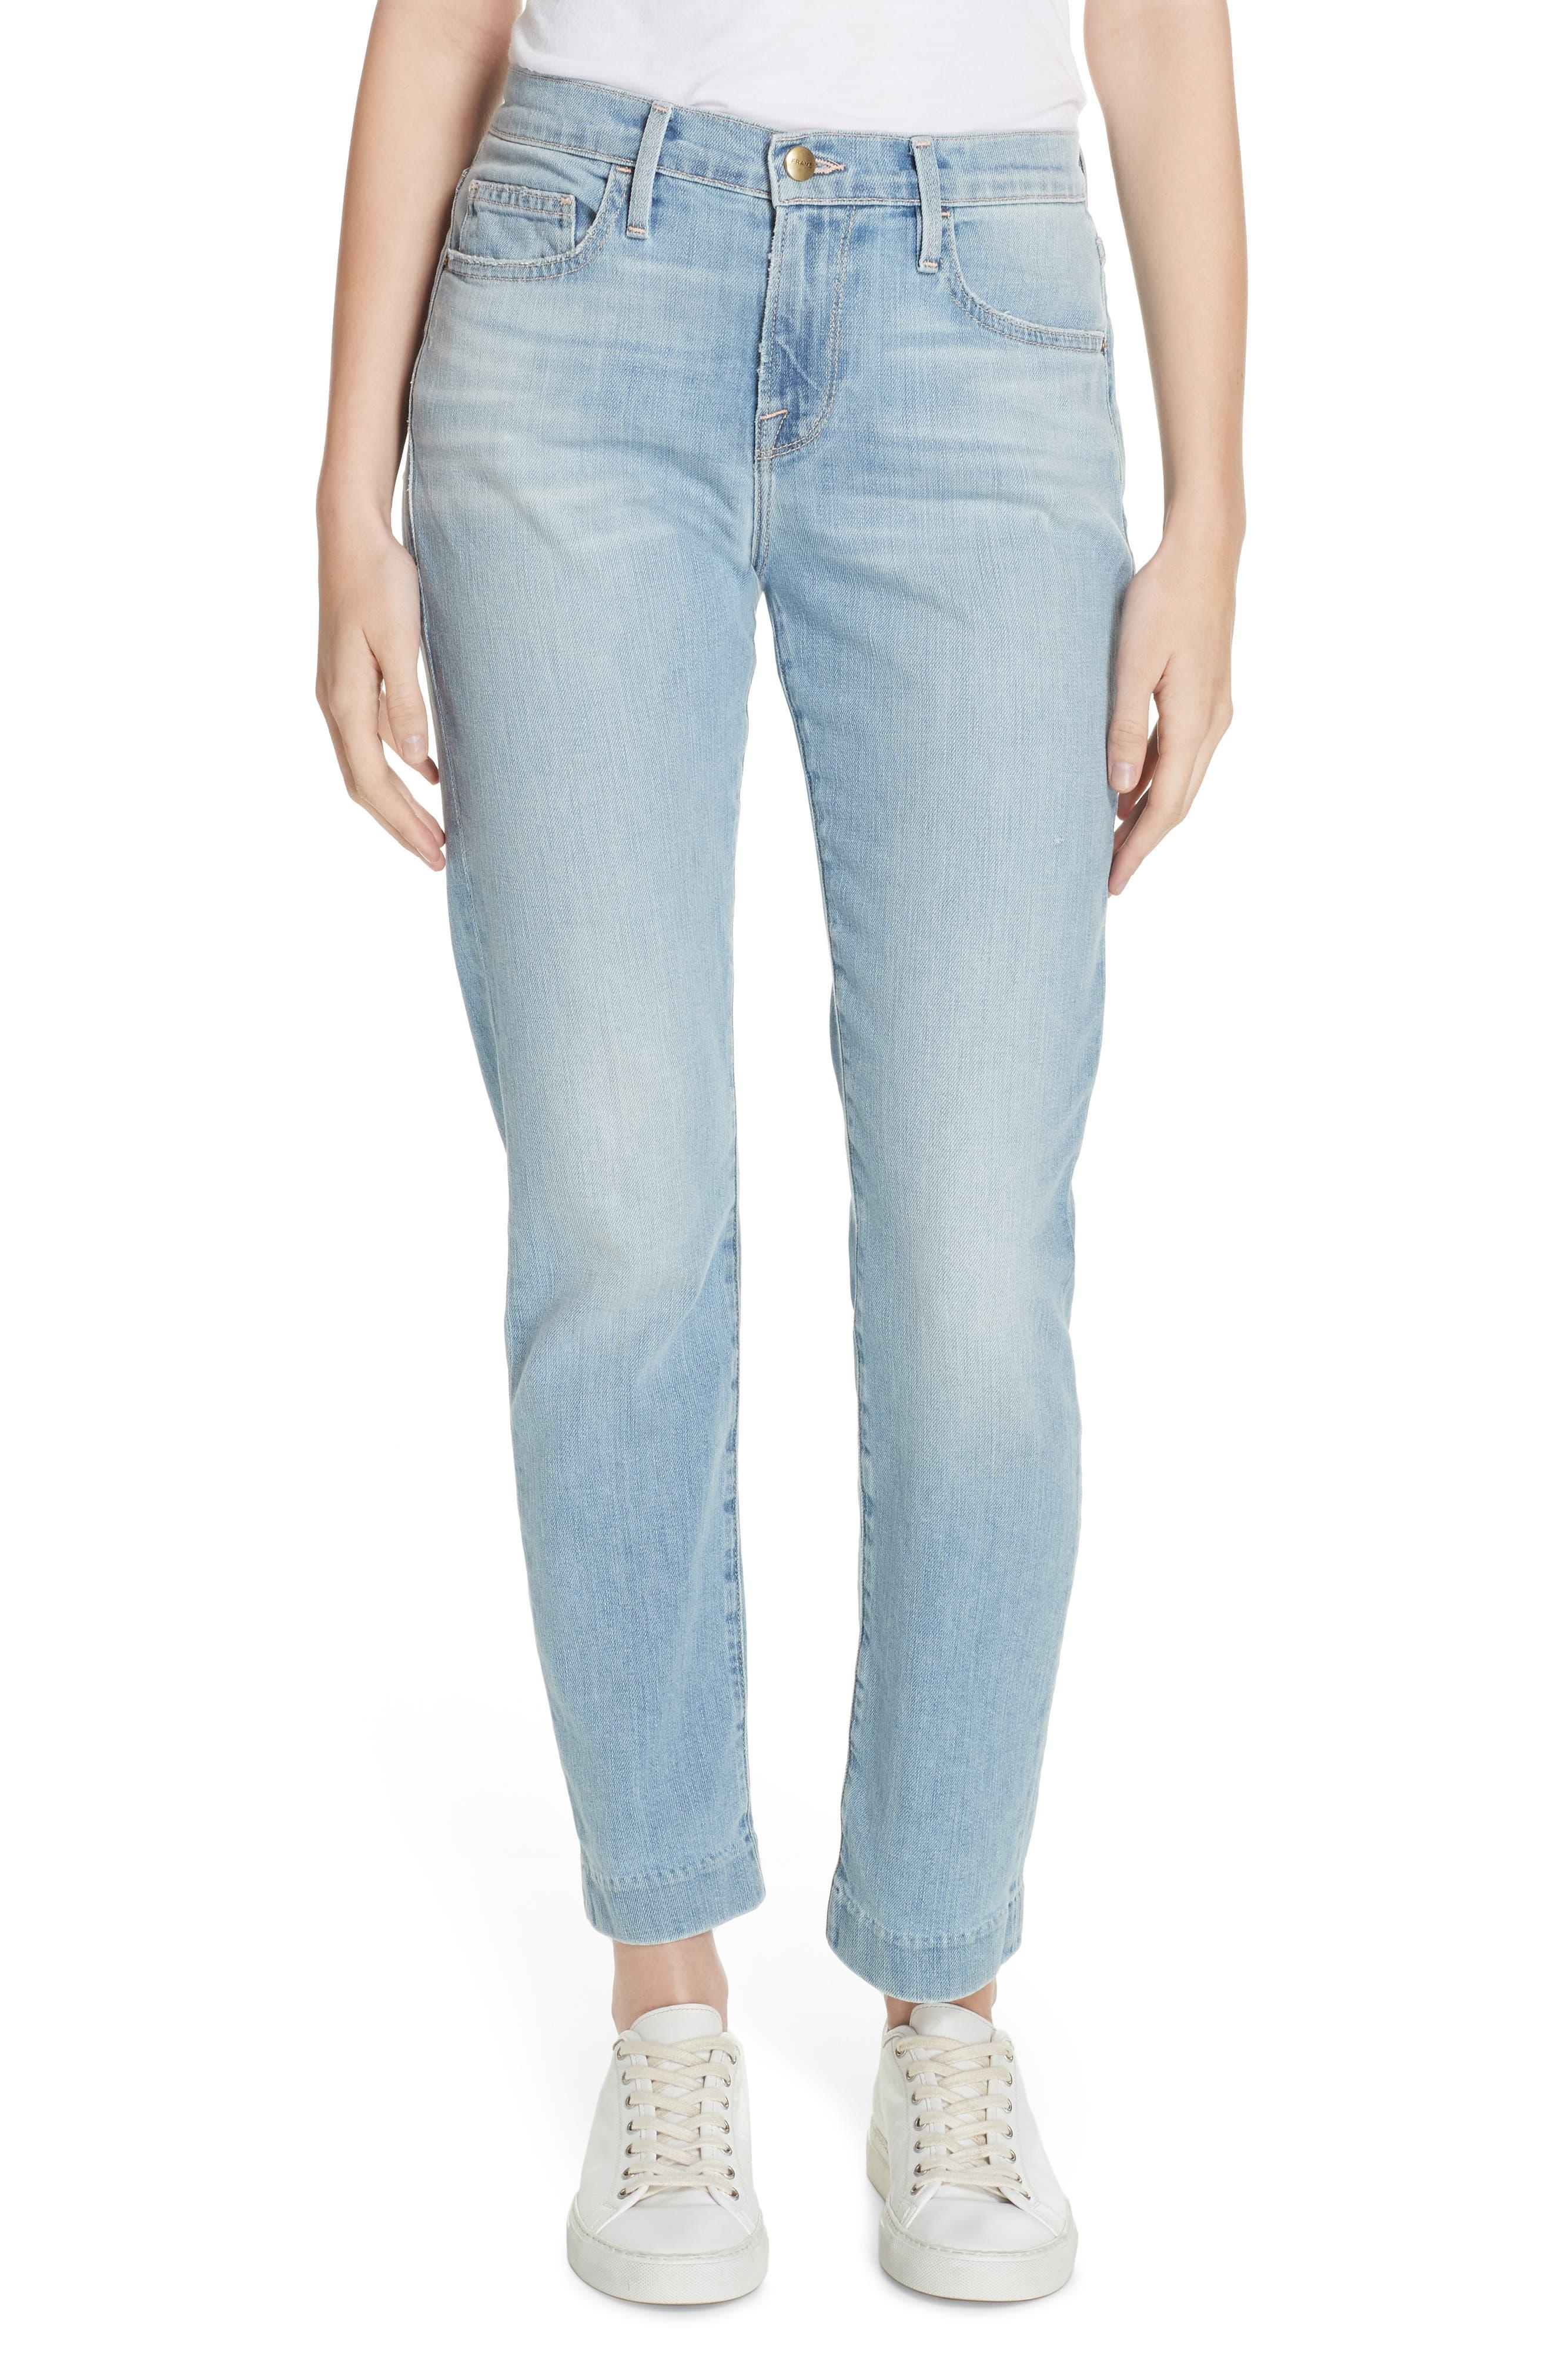 Le Boy High Waist Jeans,                             Main thumbnail 1, color,                             KEATON